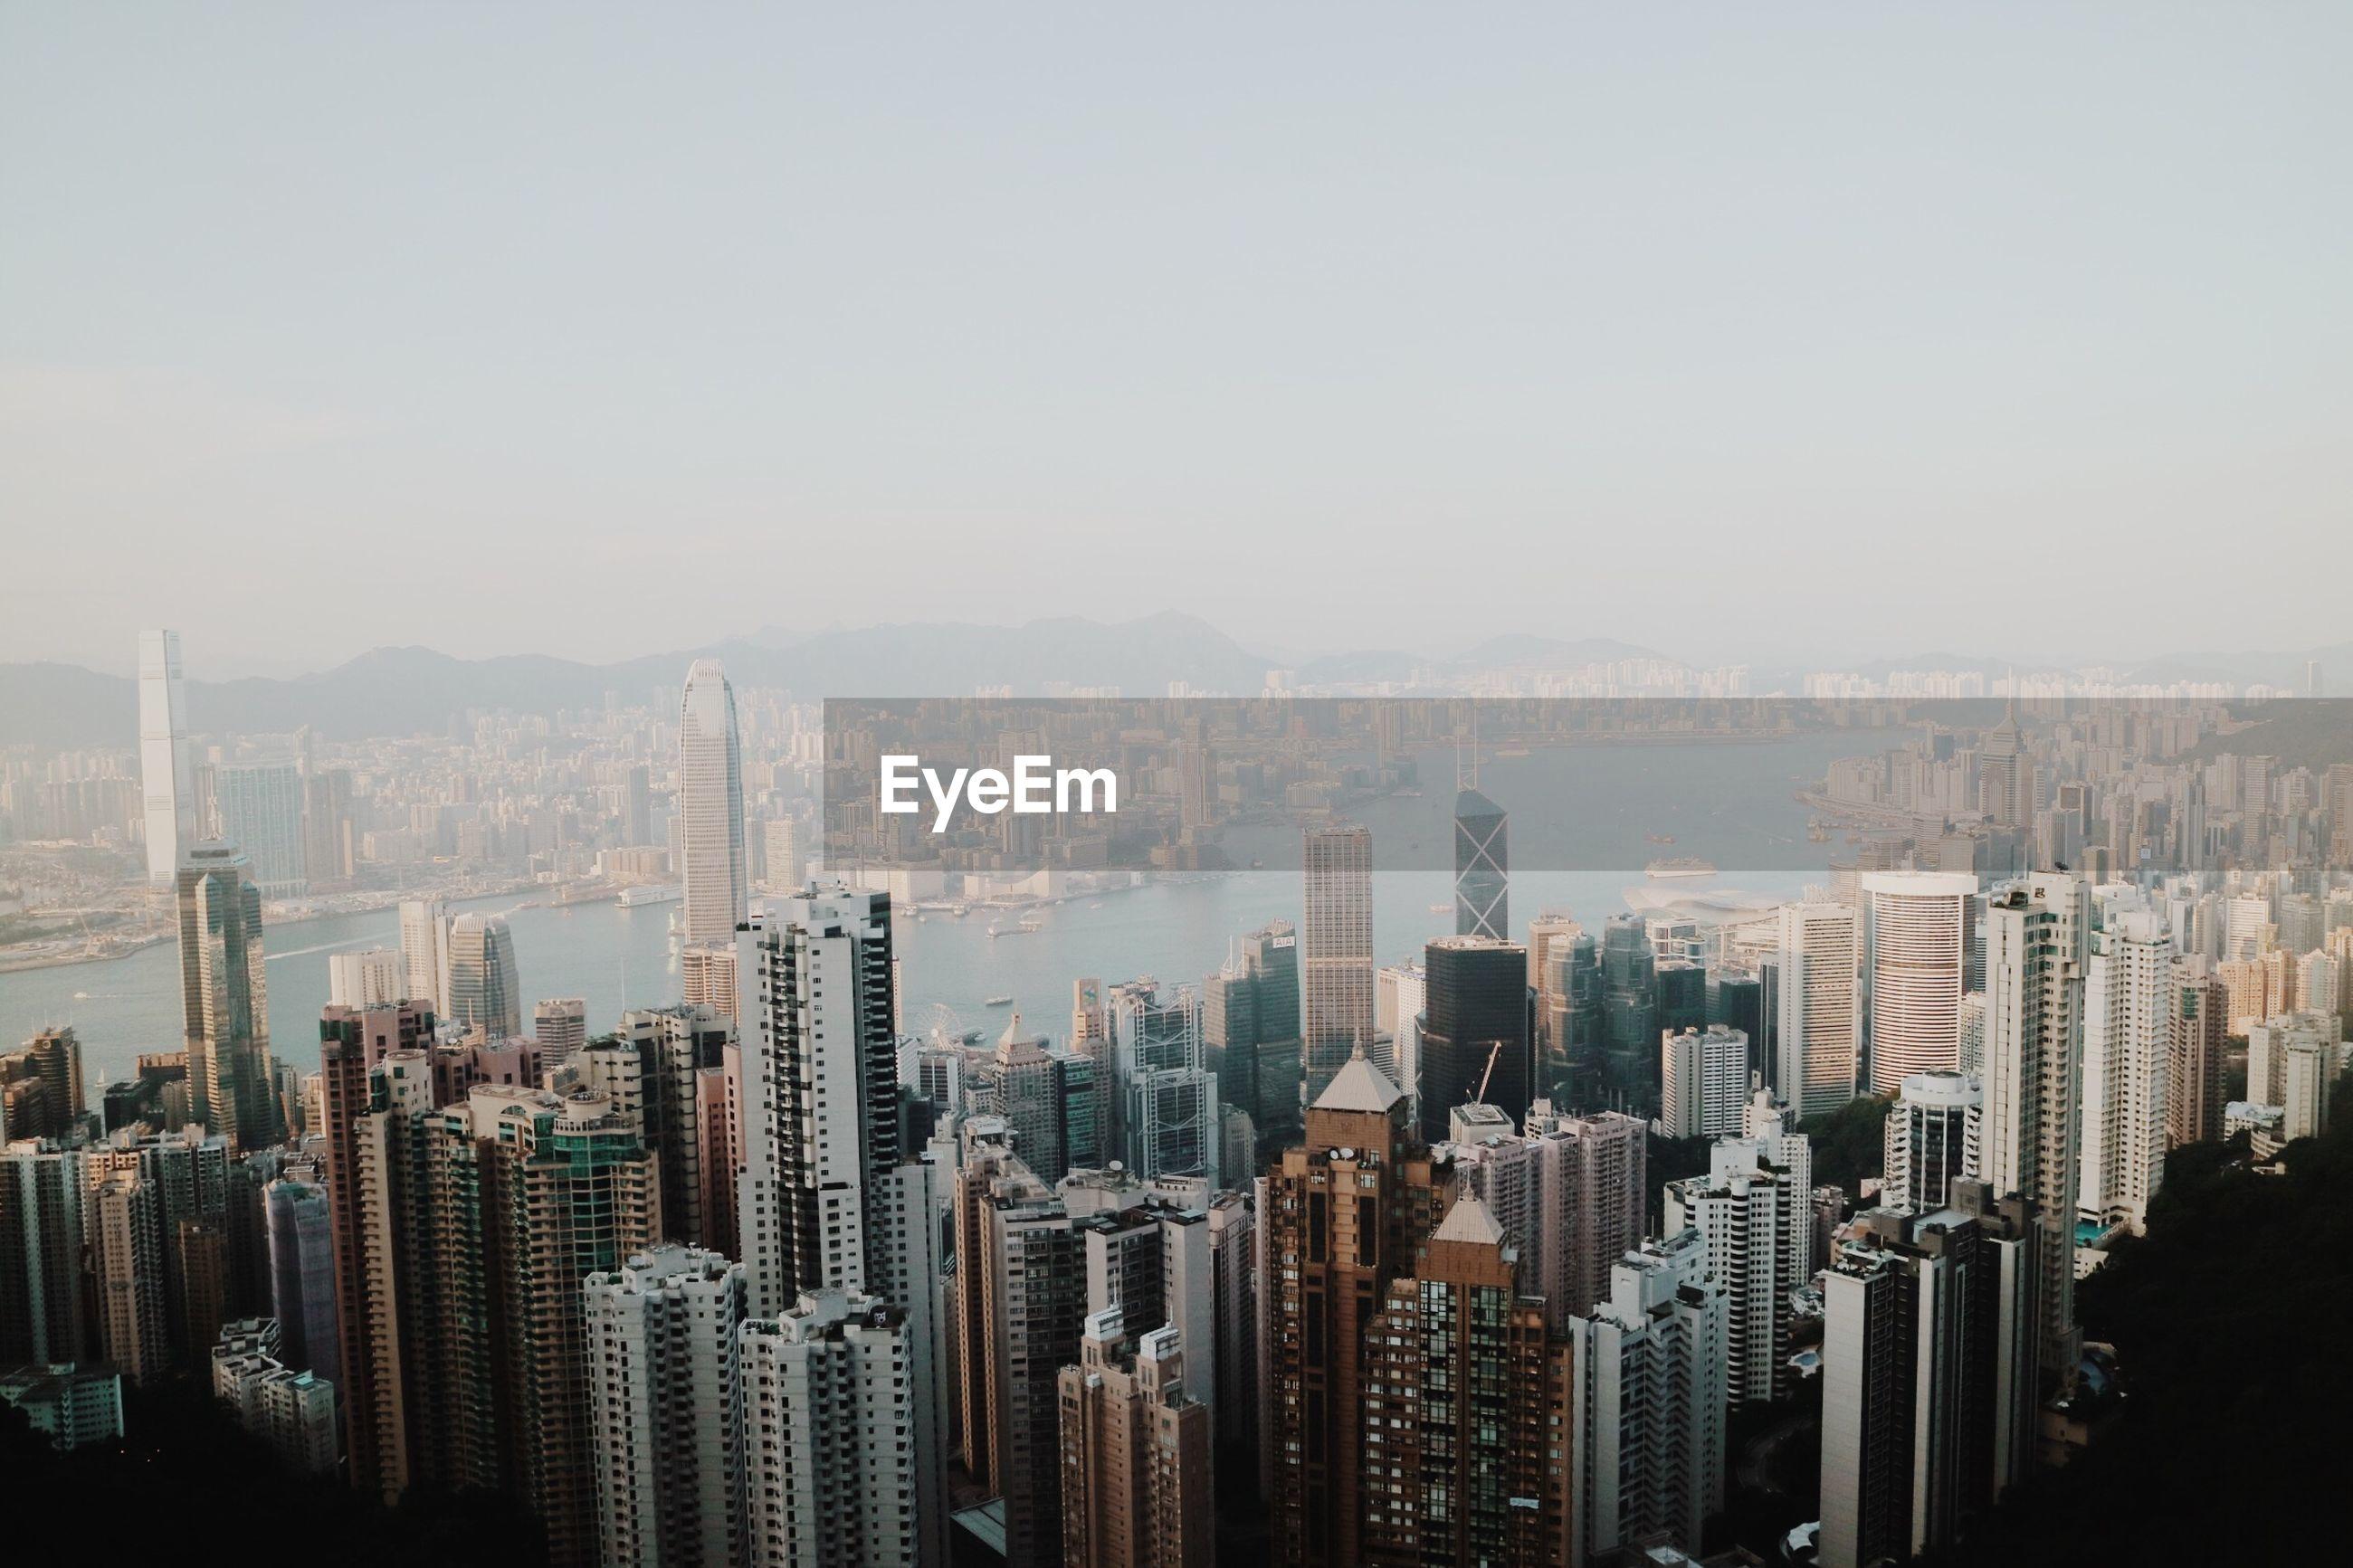 AERIAL VIEW OF MODERN BUILDINGS AGAINST CLEAR SKY